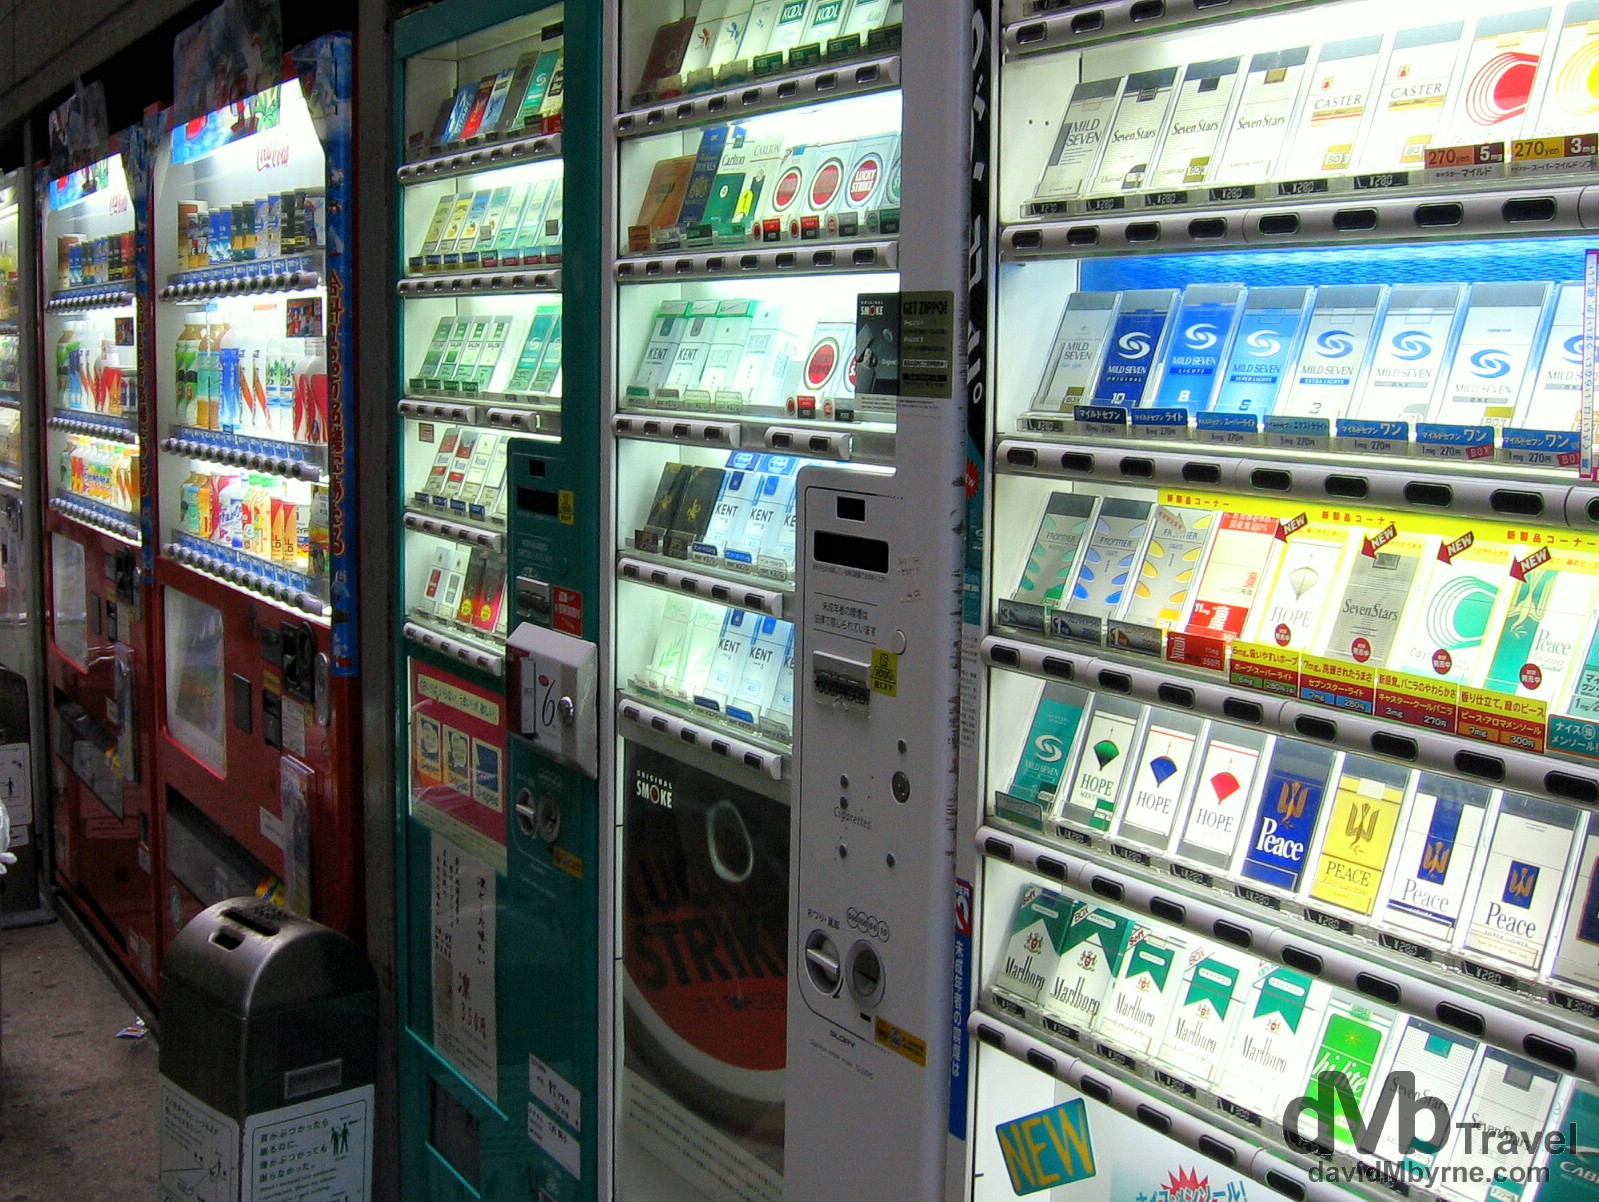 Vending machines in Kyoto, Honshu, Japan. July 18th, 2005.